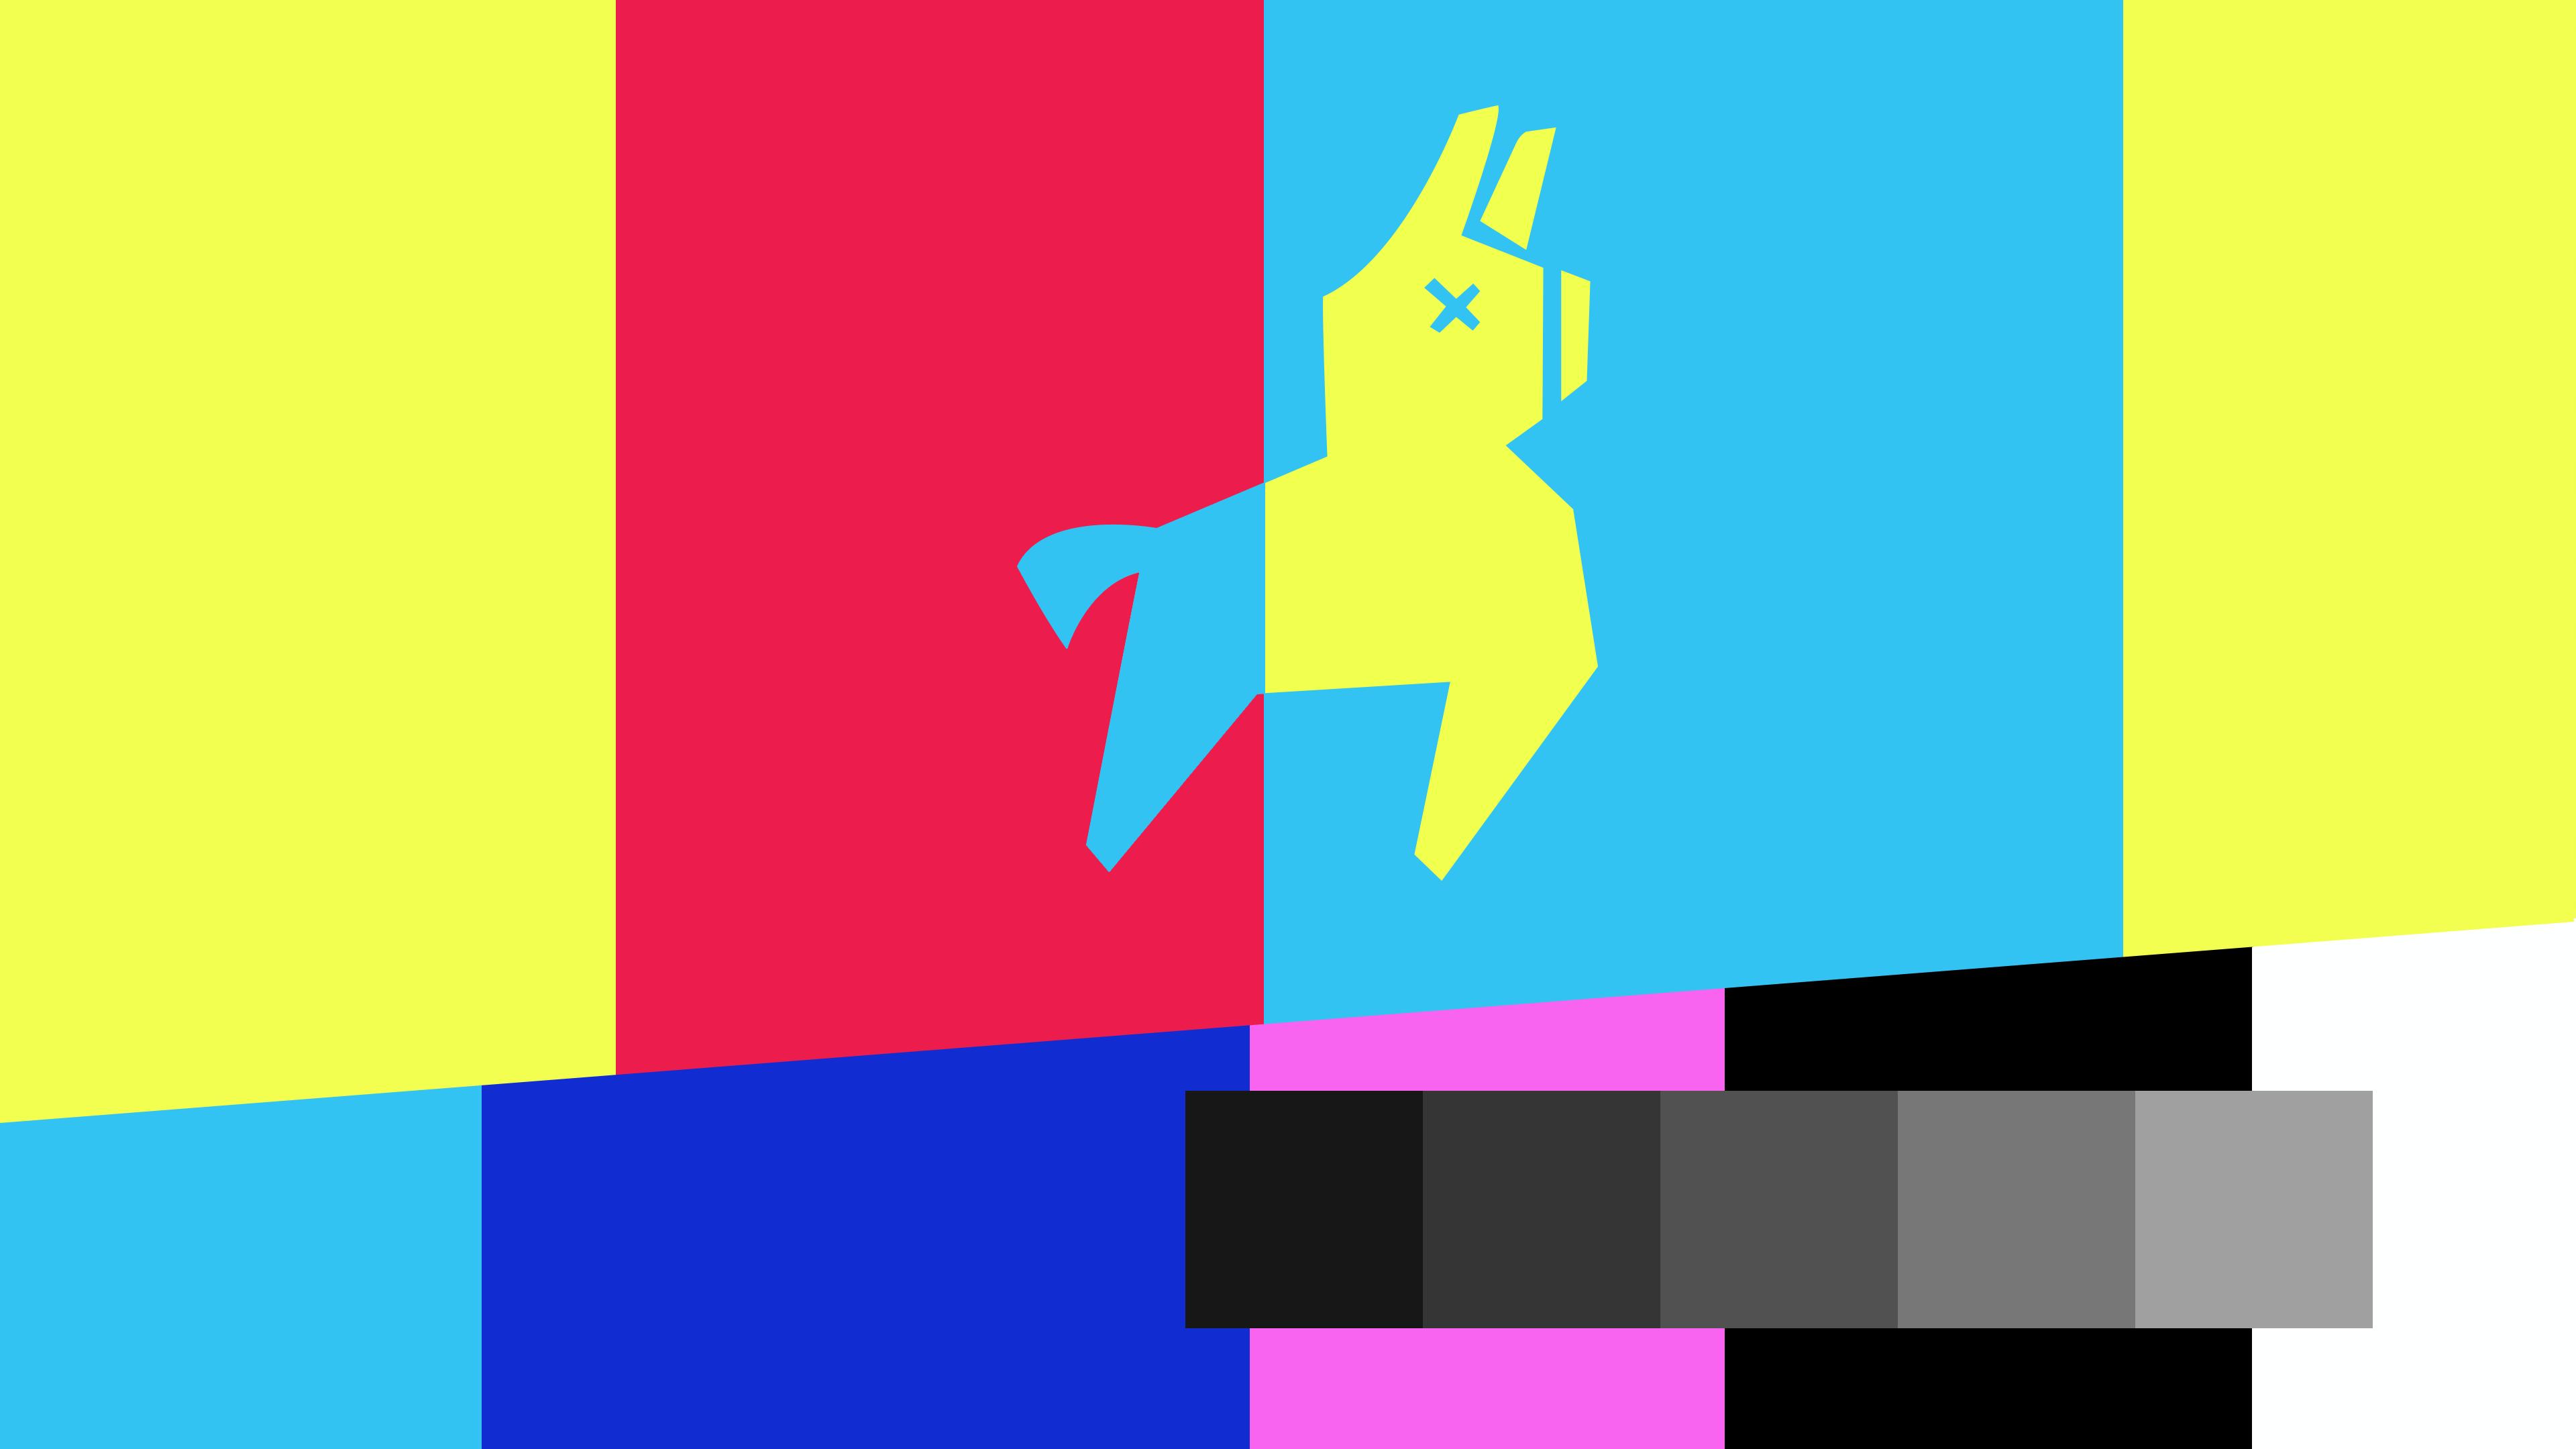 Fortnite Llama TV Warning Desktop